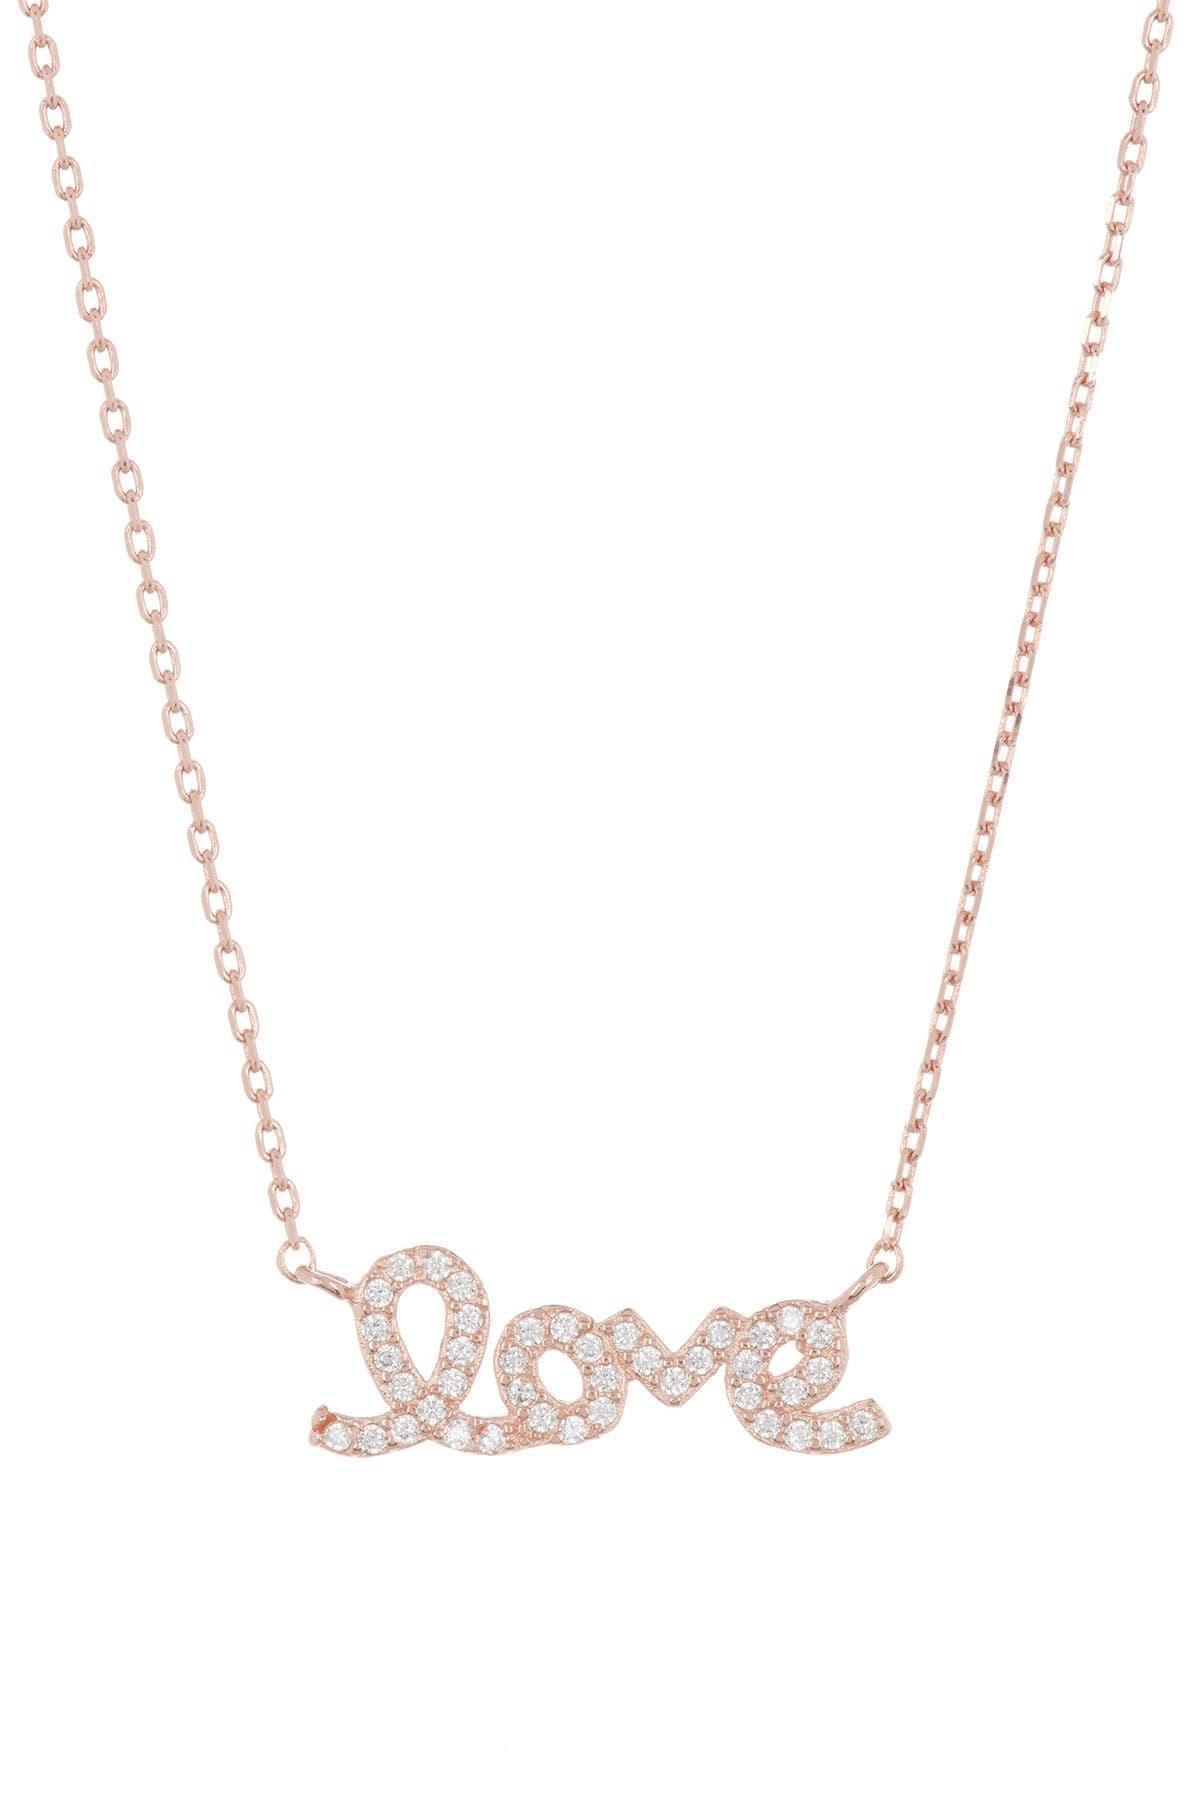 Adornia 14k Rose Gold Plated Sterling Silver Cursive Love Pendant Necklace Nordstrom Rack